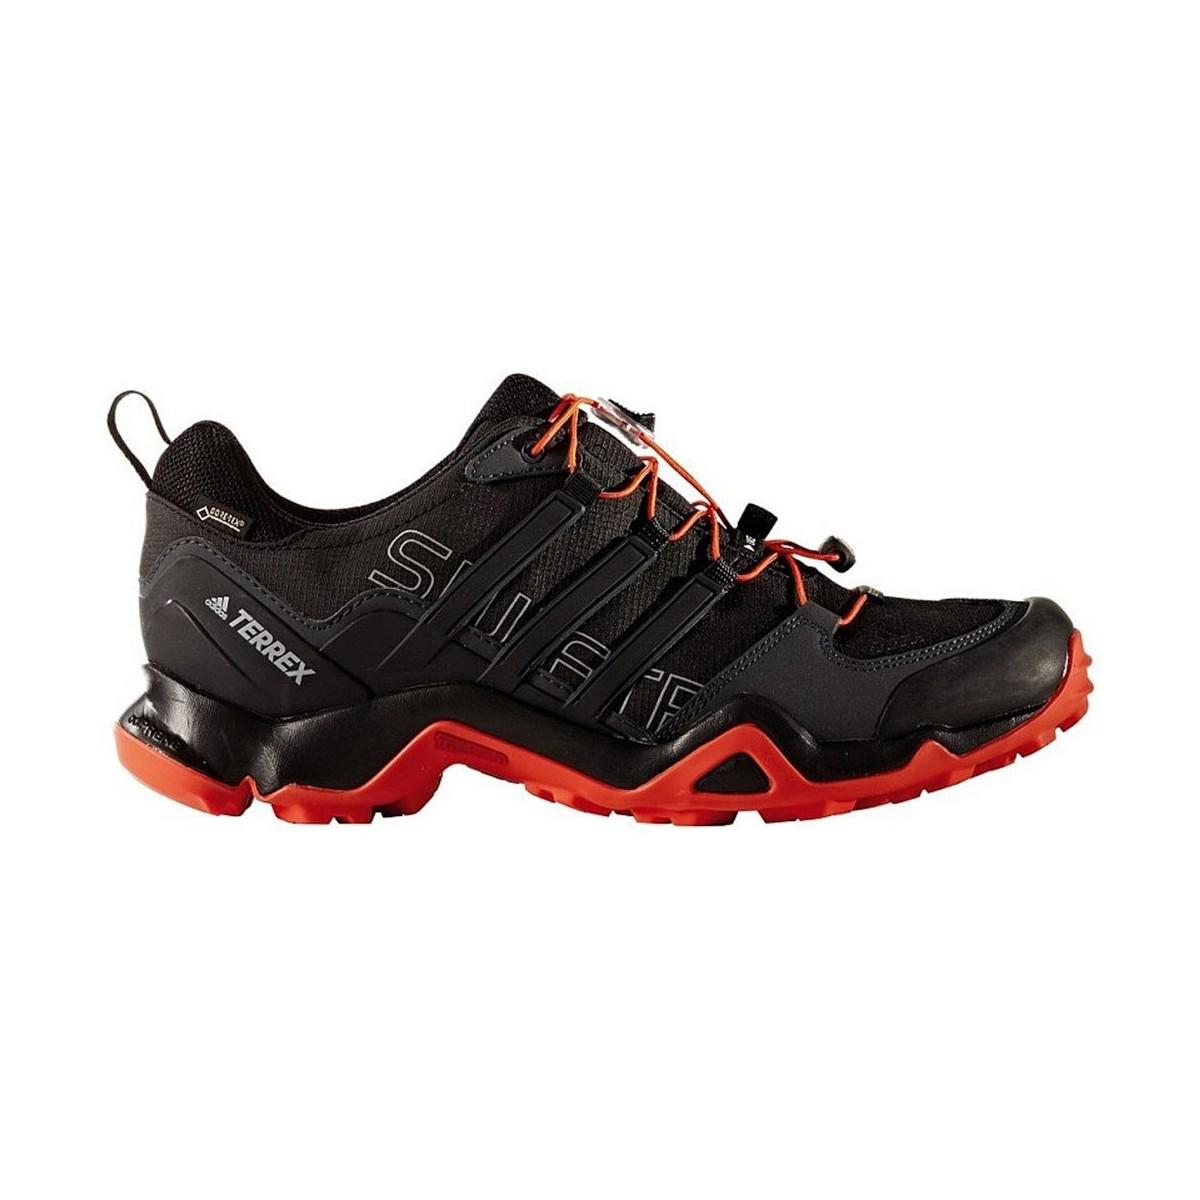 Lyst Adidas Terrex Swift R GTX Goretex hombre 's zapatos (formadores)